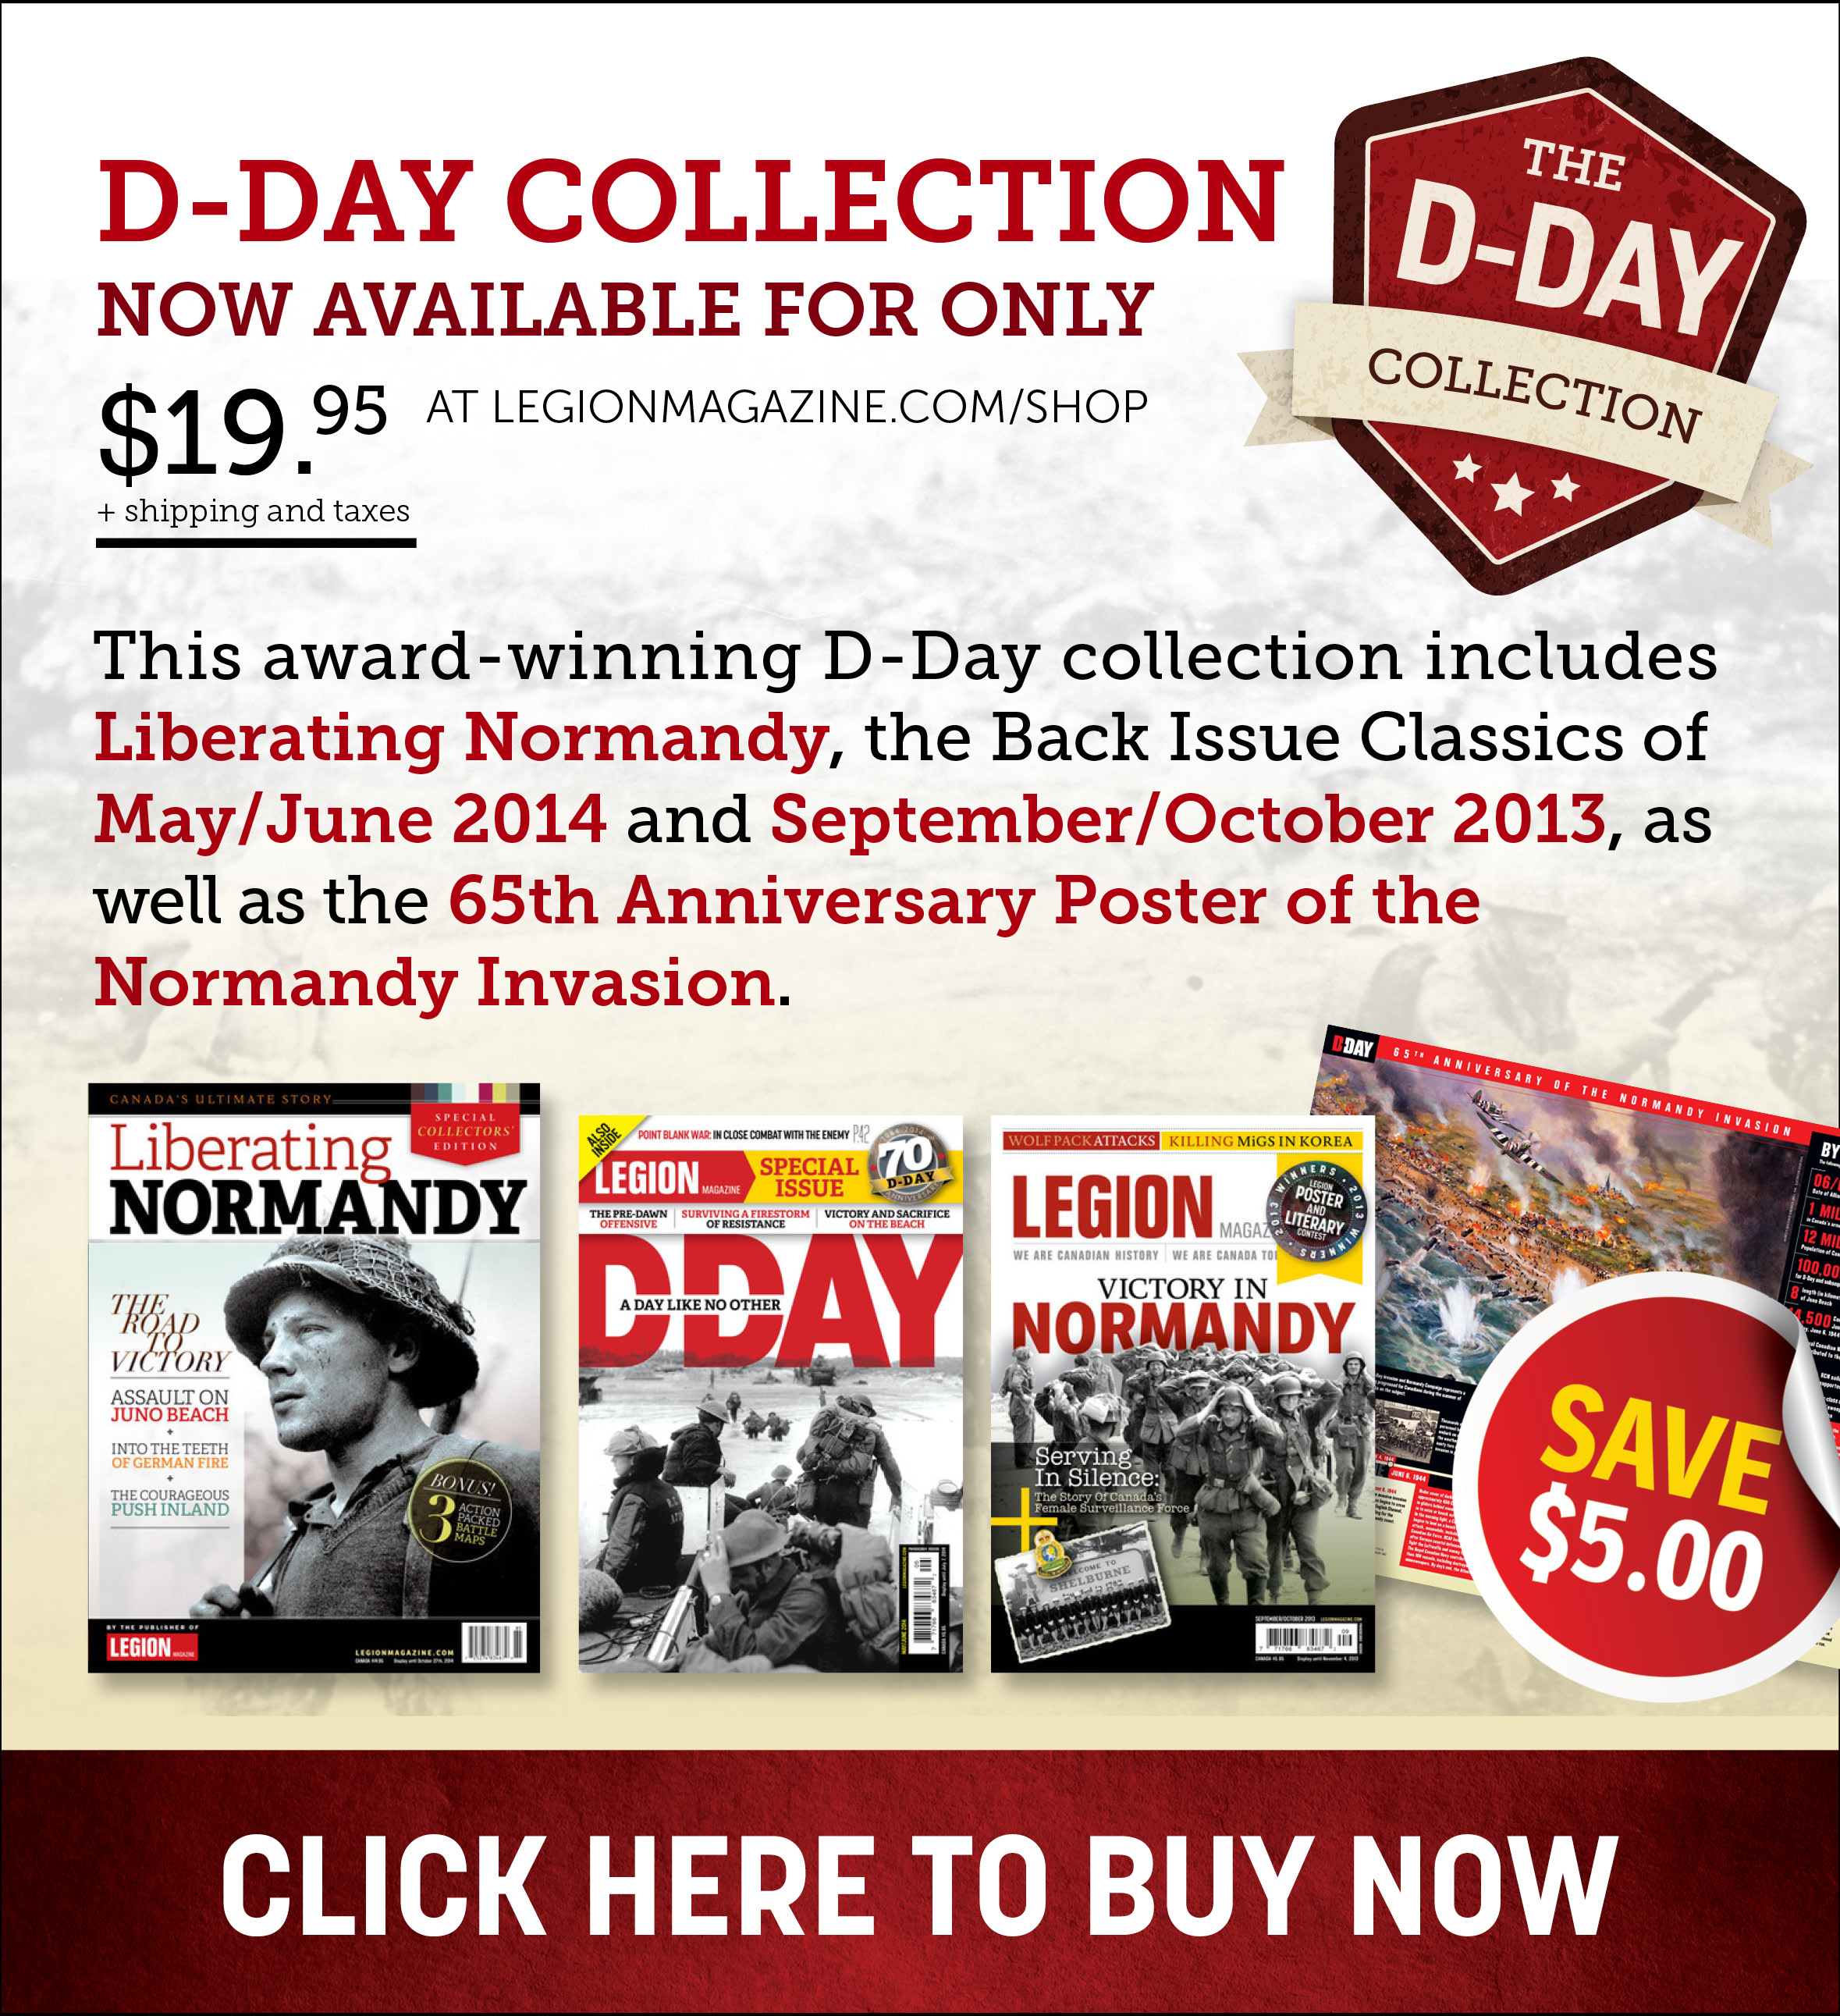 DDAY_Newsletter_Ad_PriceDrop